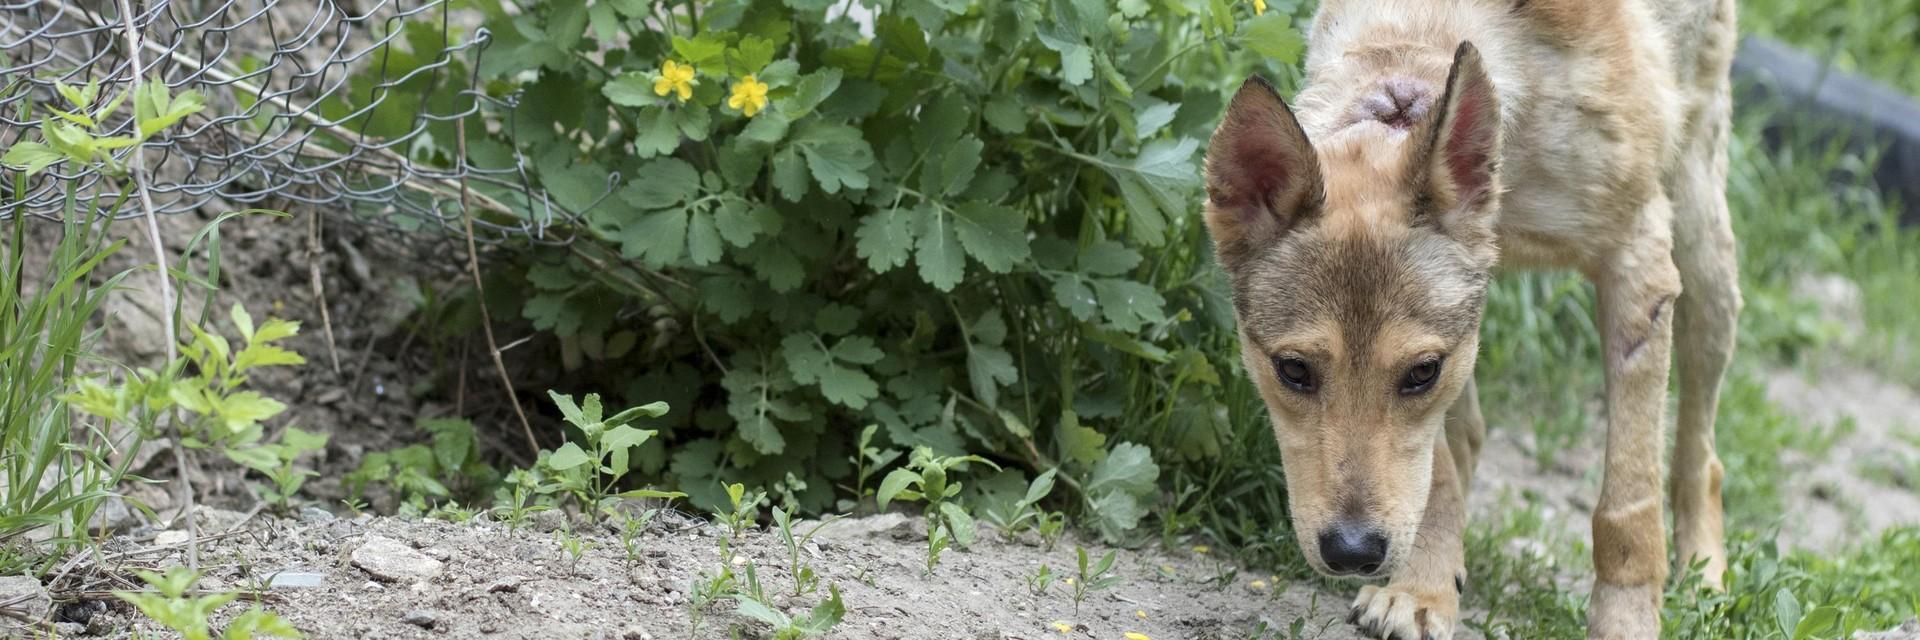 Streunerhund Jason aus Bulgarien